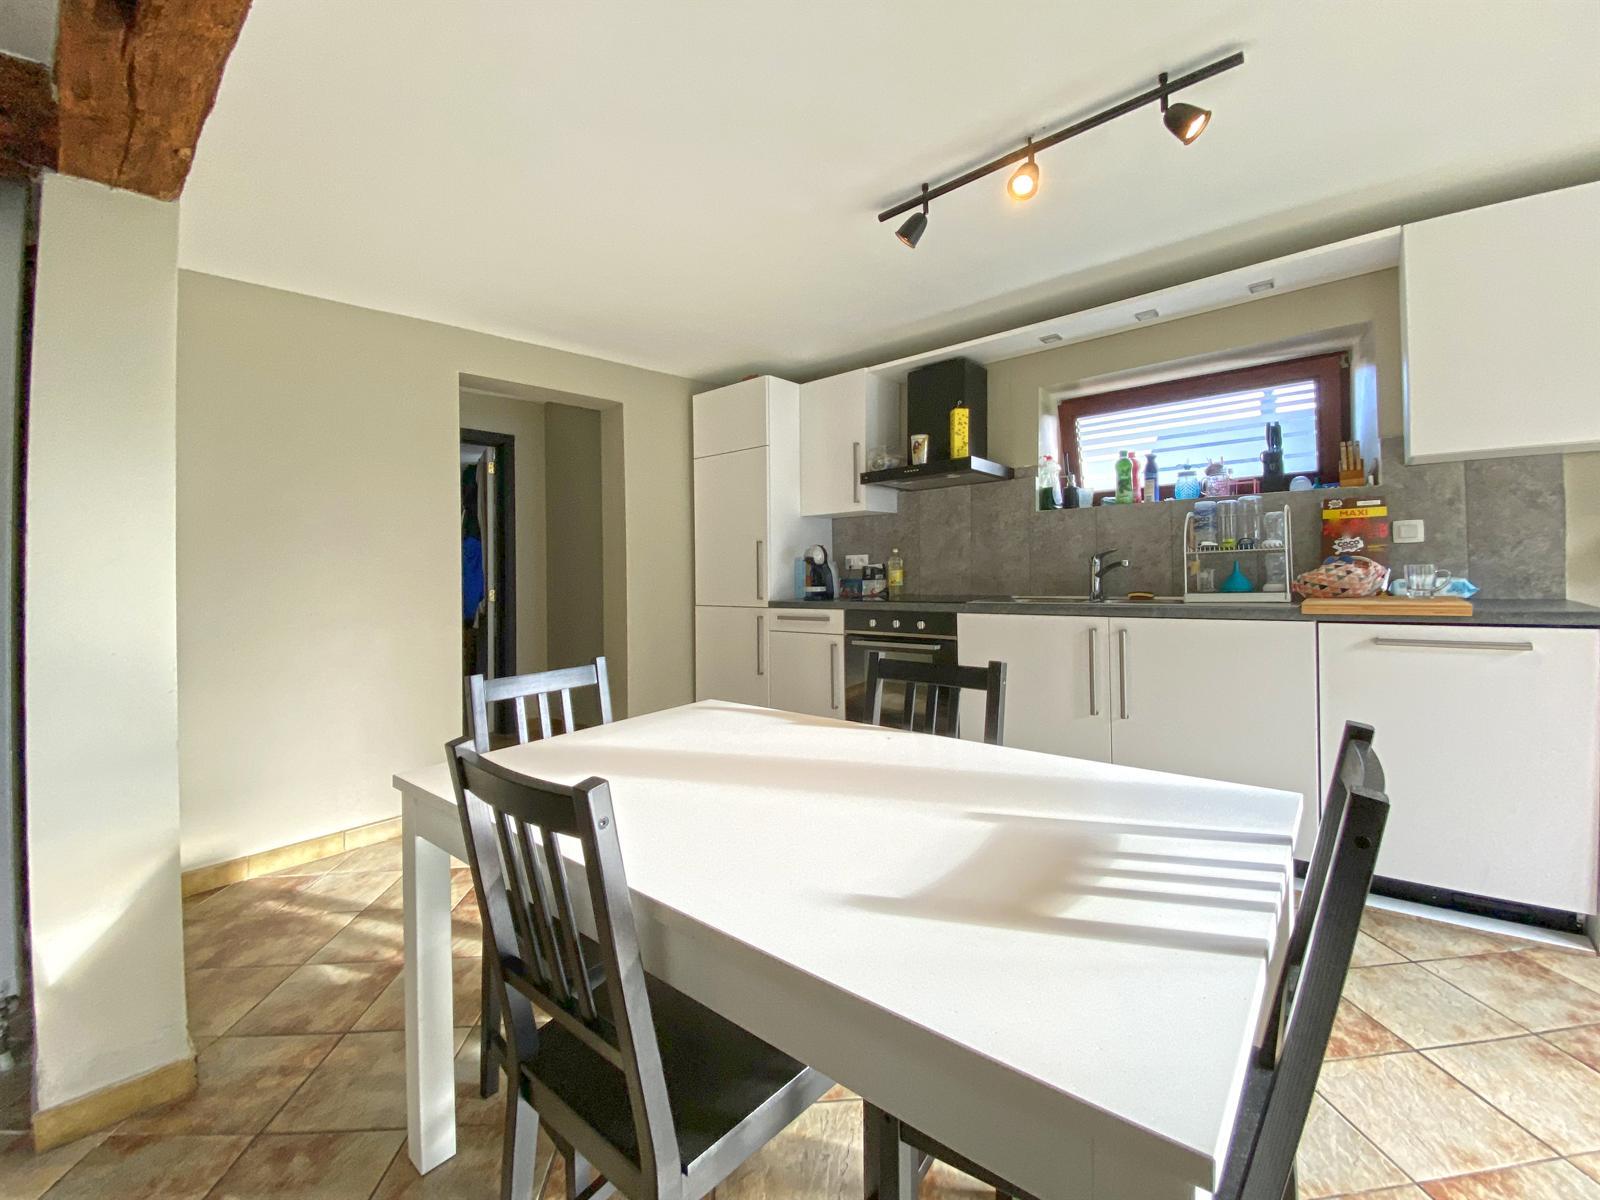 Maison - Libramont-Chevigny - #4508306-3